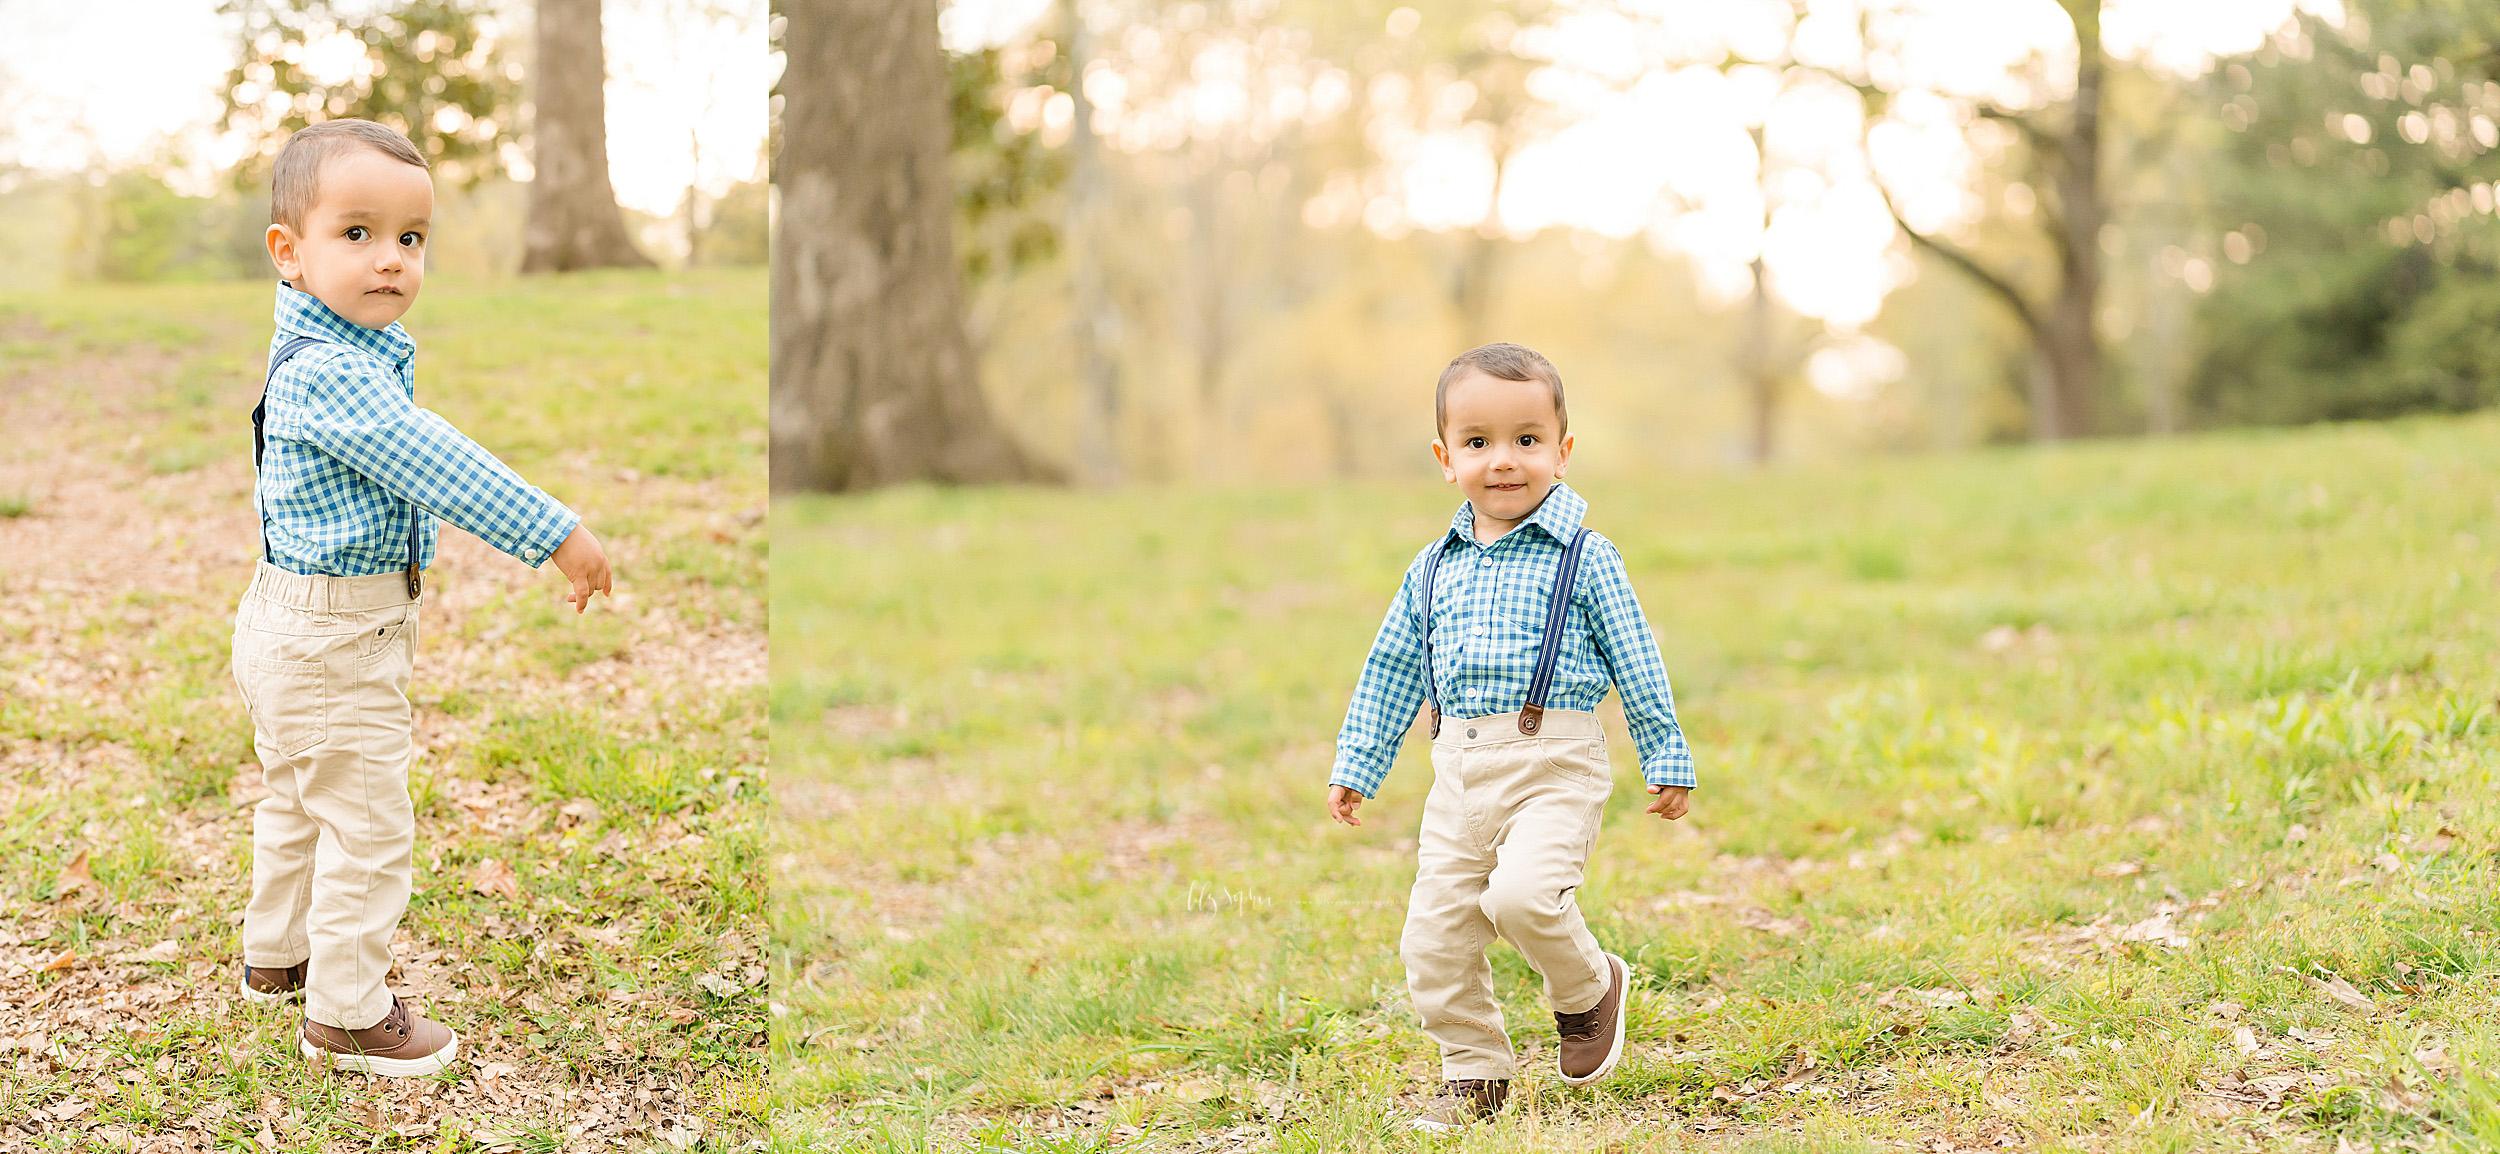 atlanta-covington-sandy-springs-buckhead-virginia-highlands-west-end-decatur-lily-sophia-photography-second-birthday-toddler-boy-two-outdoor-family-photos_0978.jpg